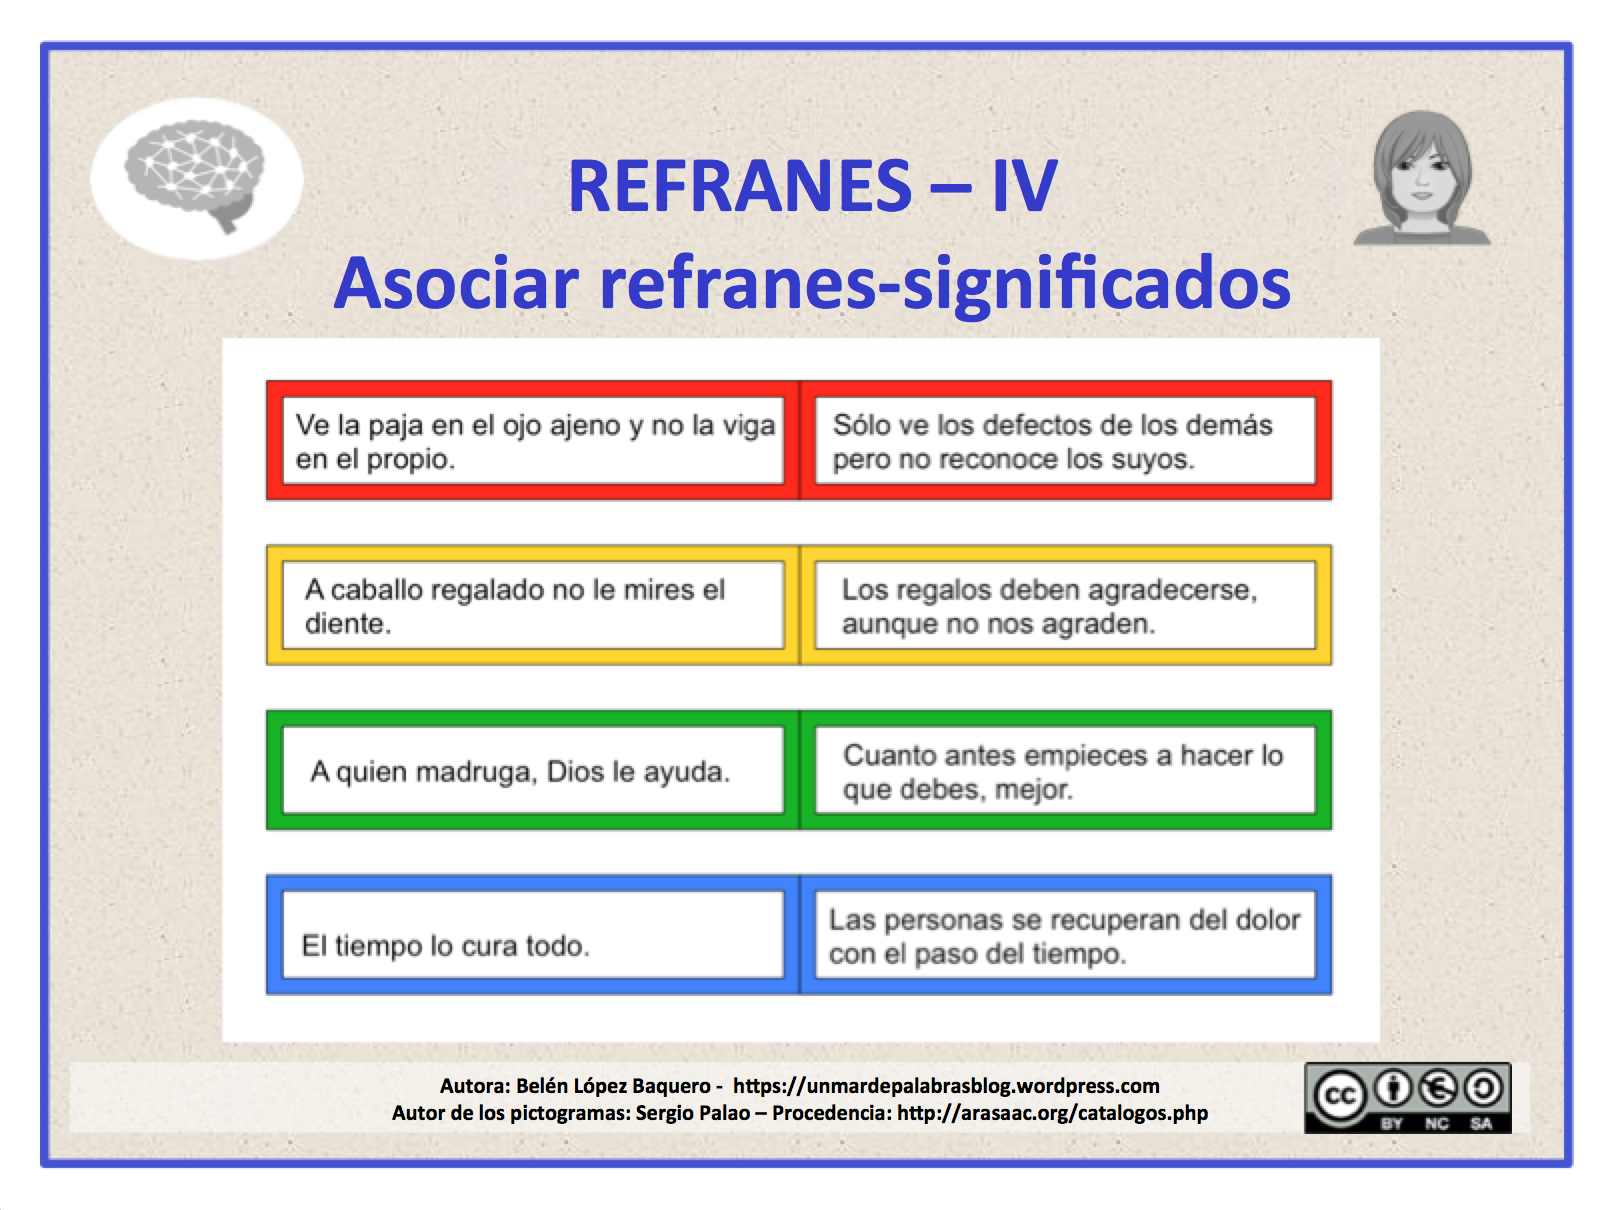 Refranes-IV